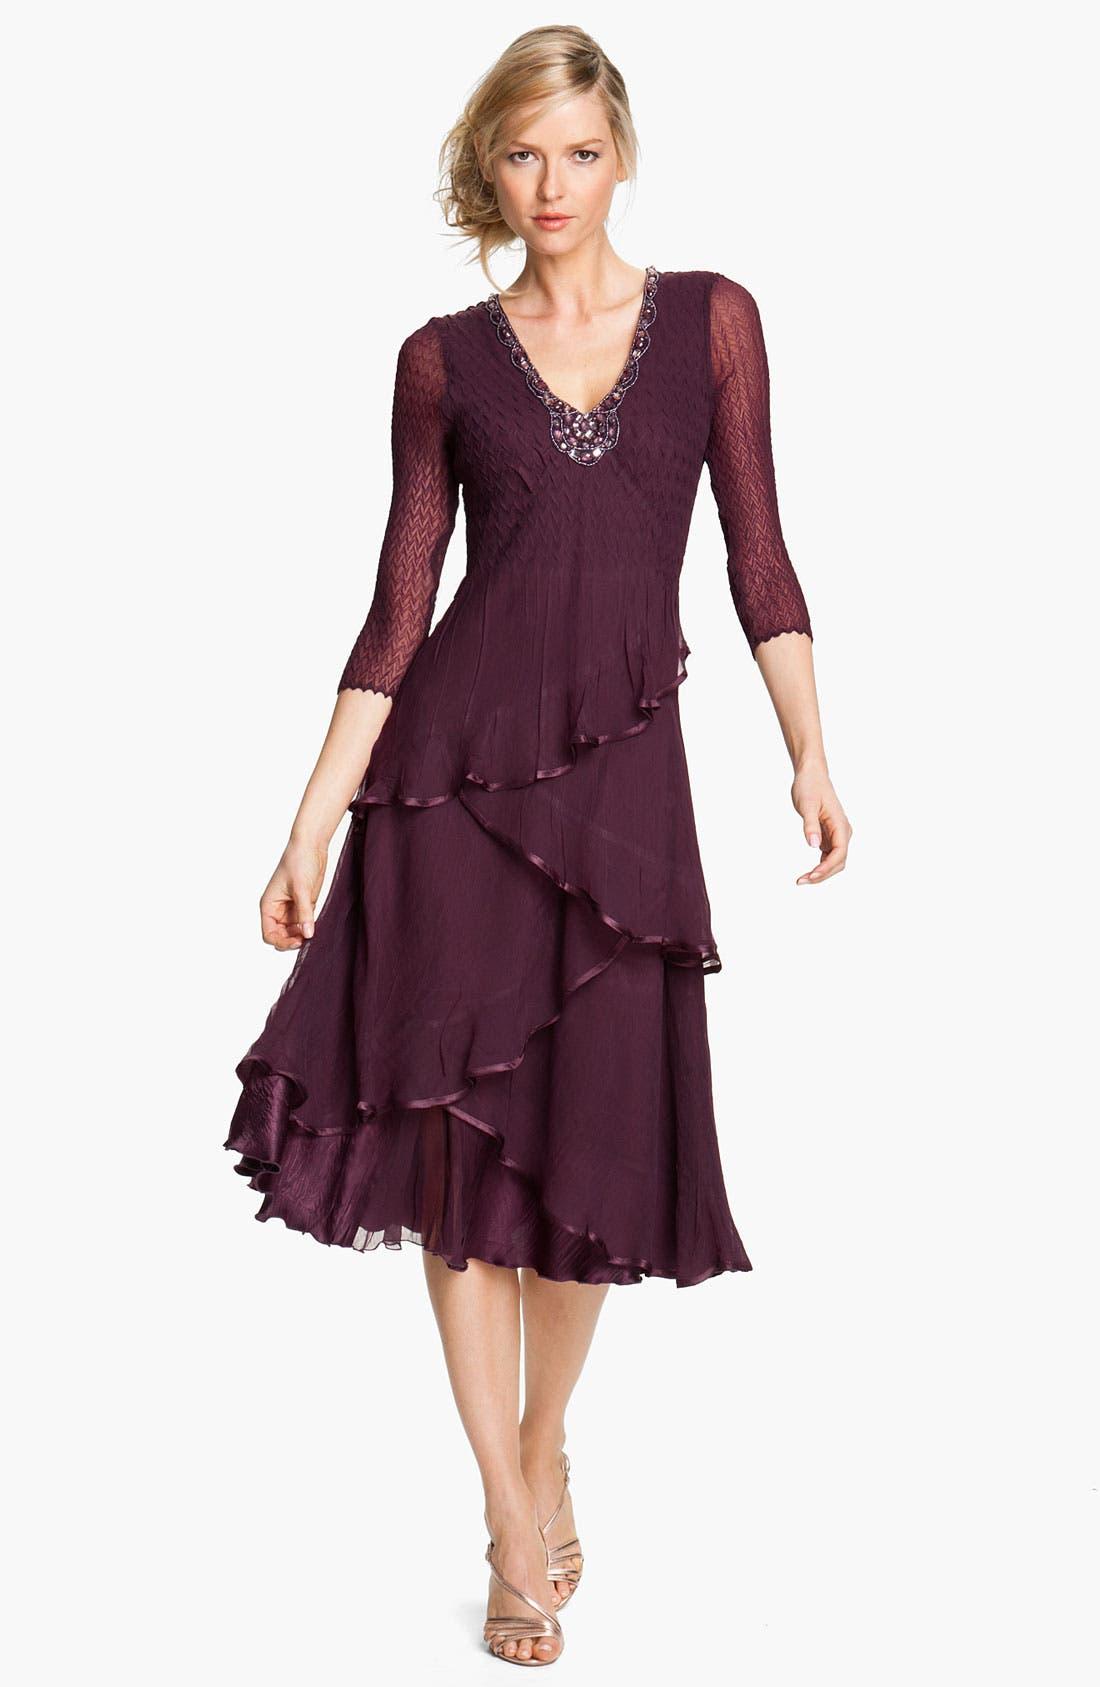 Alternate Image 1 Selected - Komarov Embellished Tiered Chiffon Dress